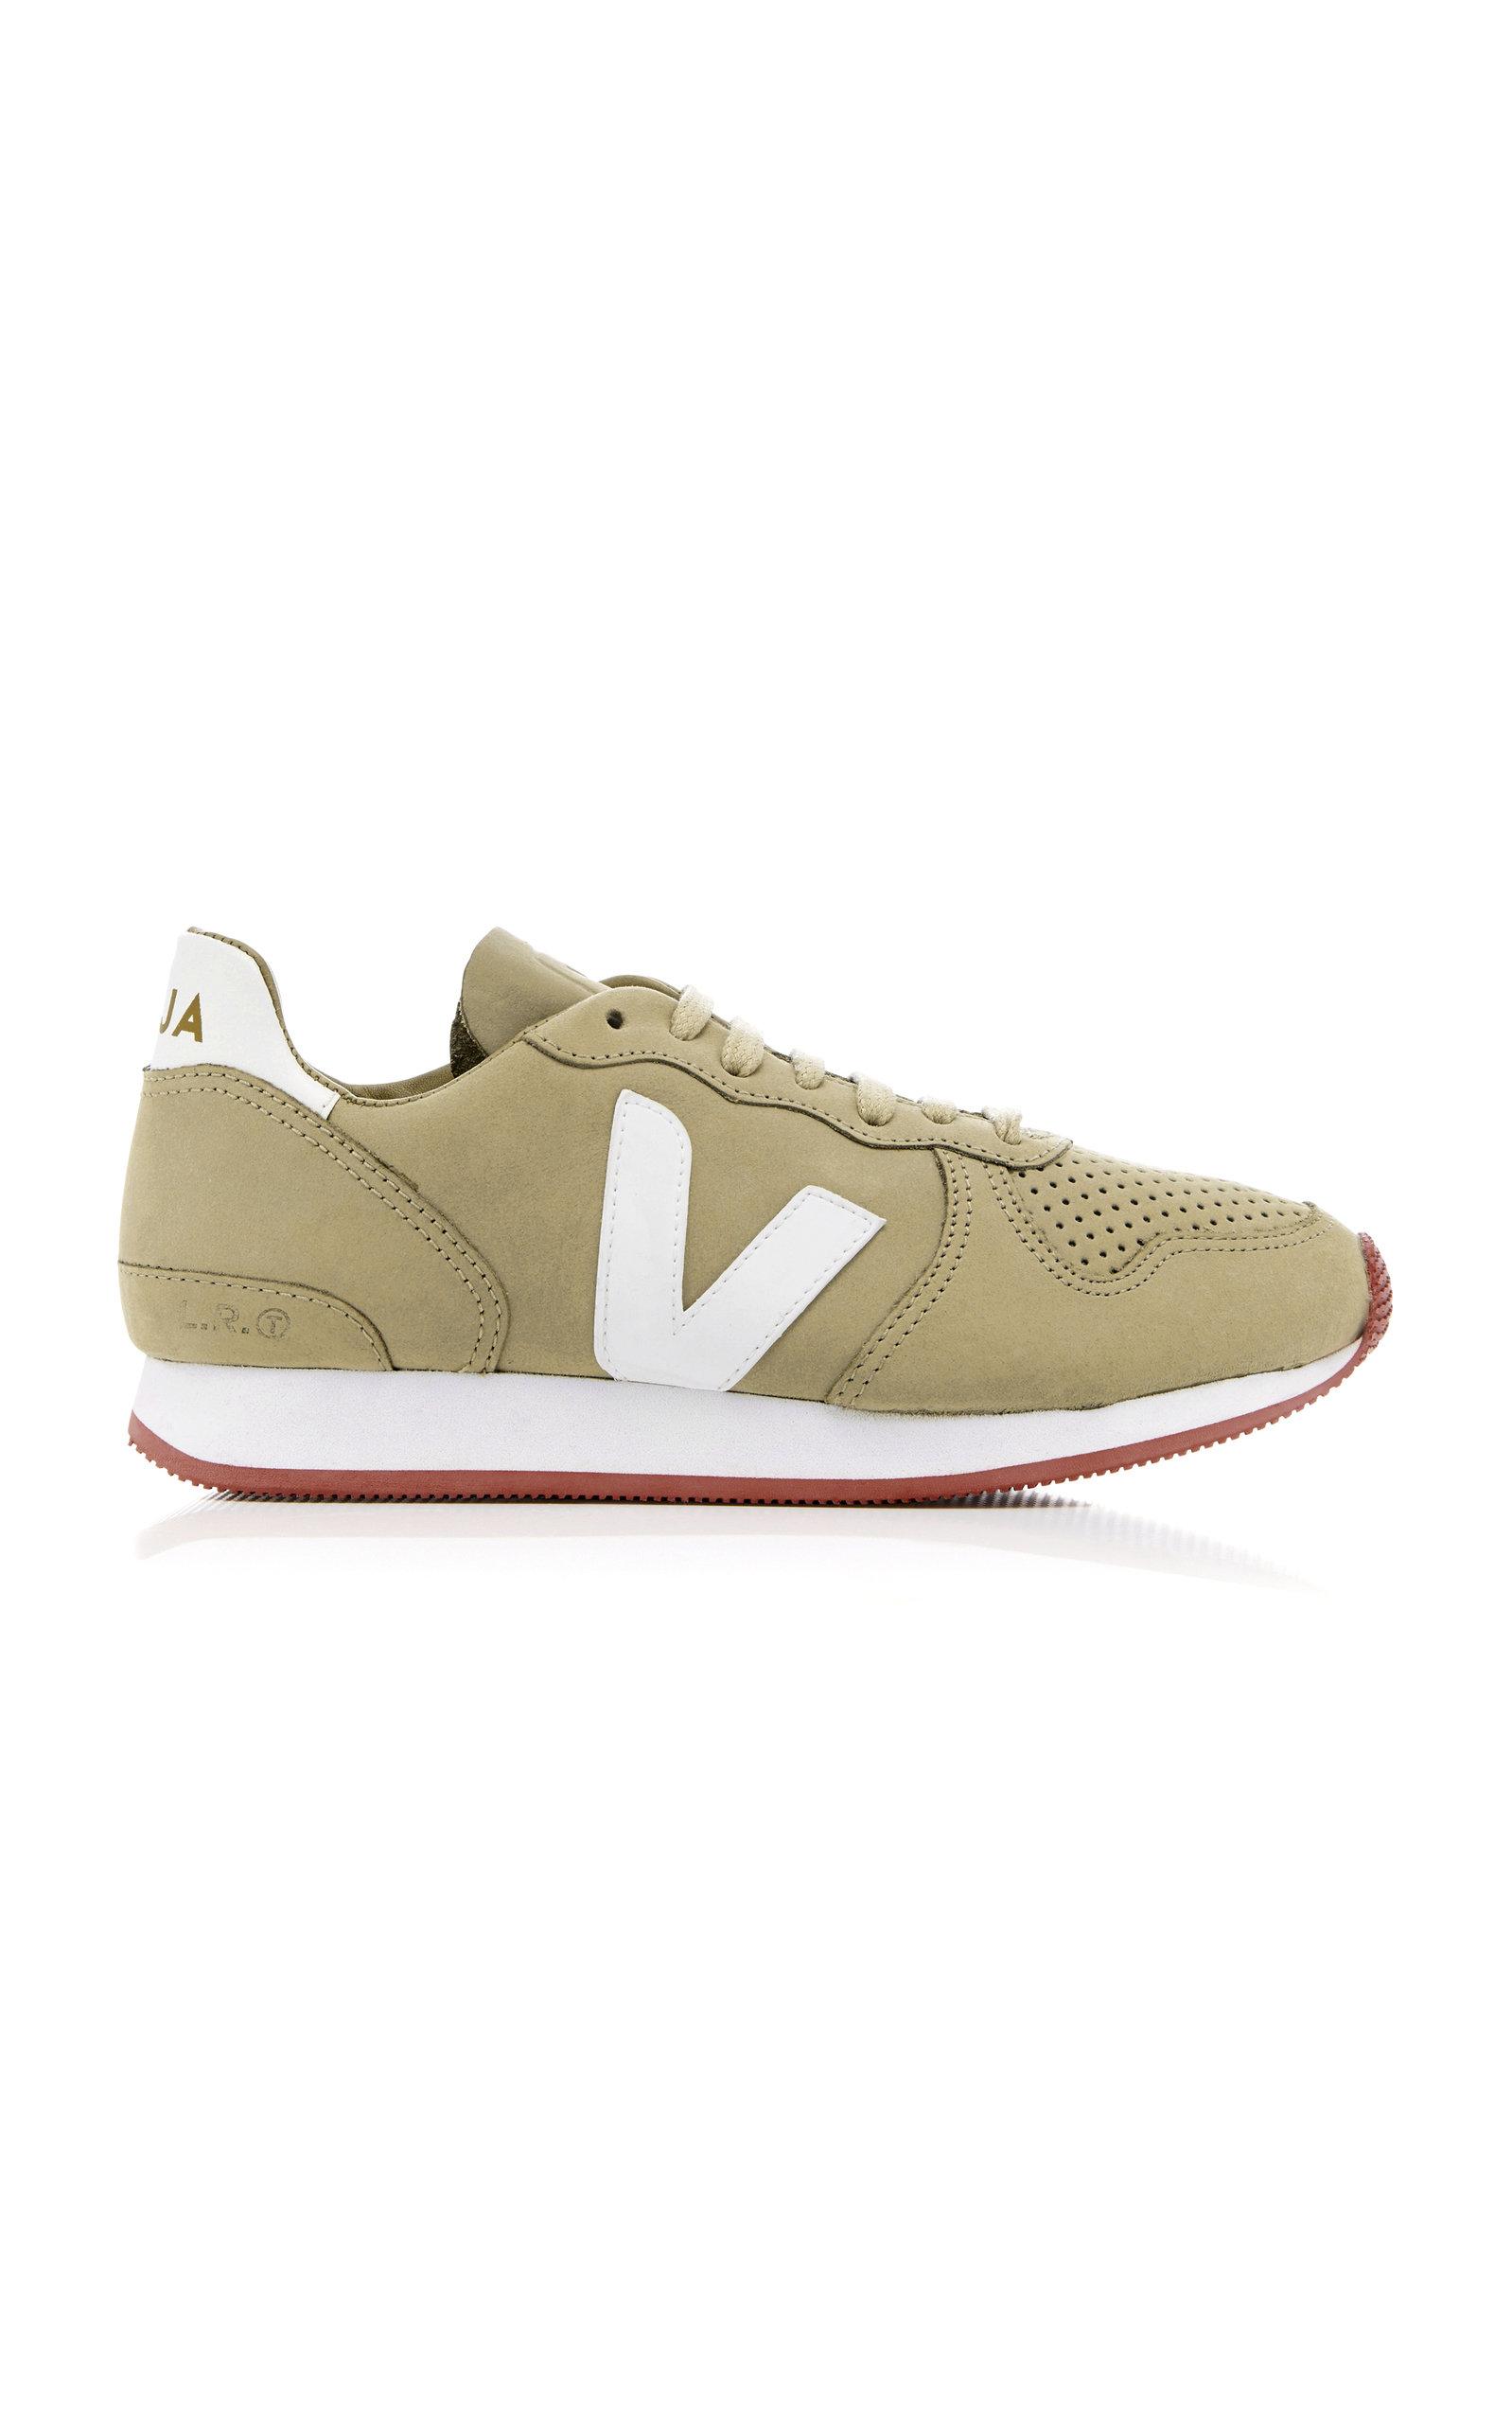 Veja | VEJA Holiday Bastille Leather Sneaker | Clouty